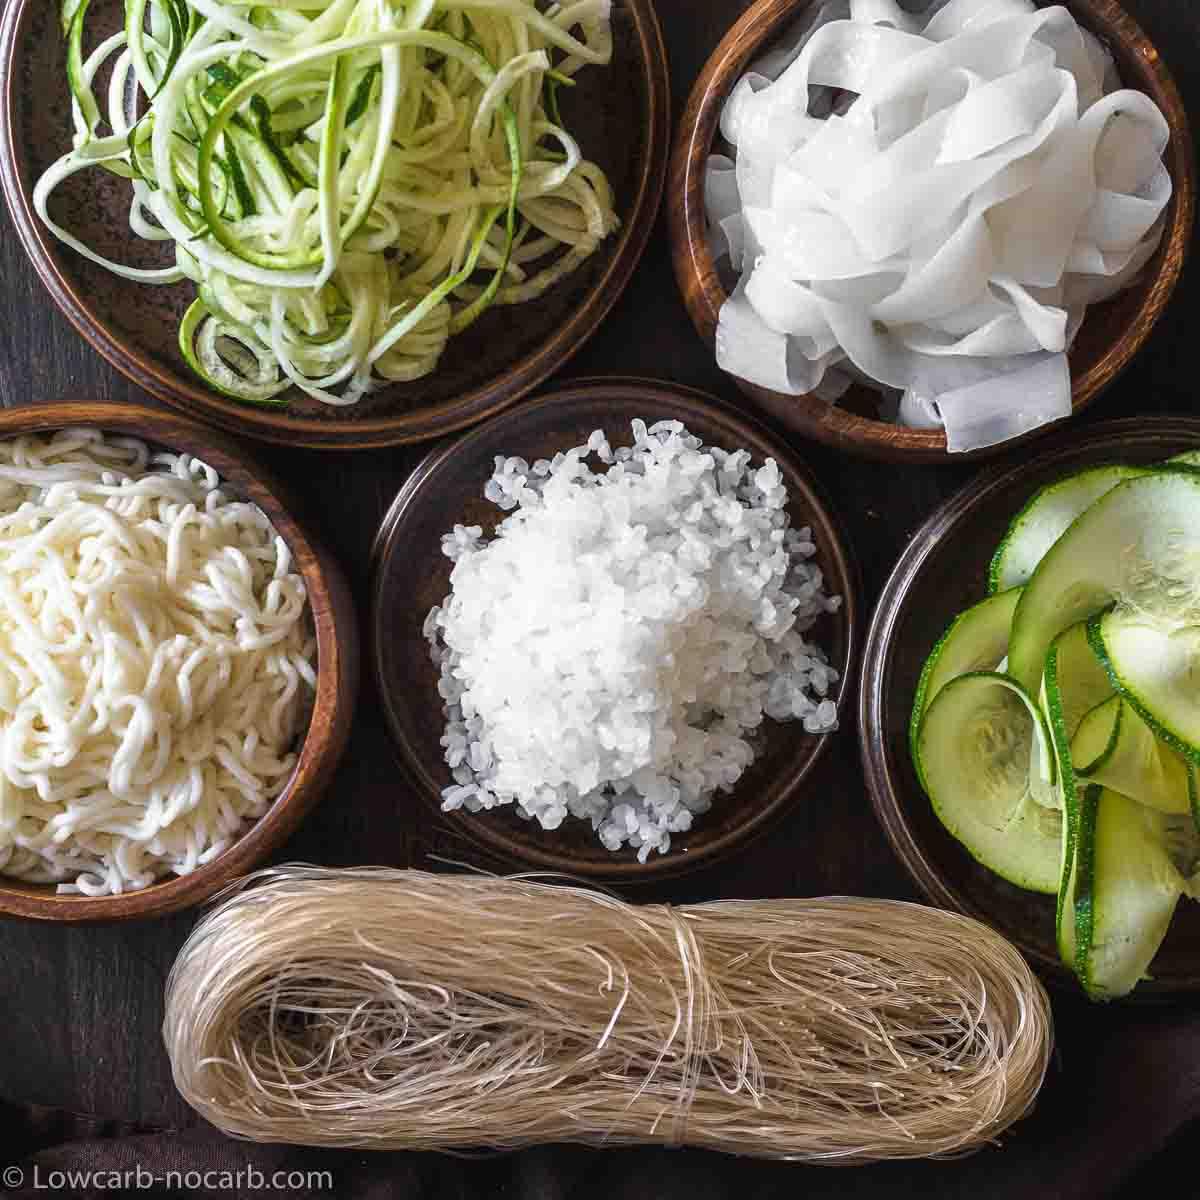 Keto and Low Carb Noodles, Pasta, Gnocchi alternatives